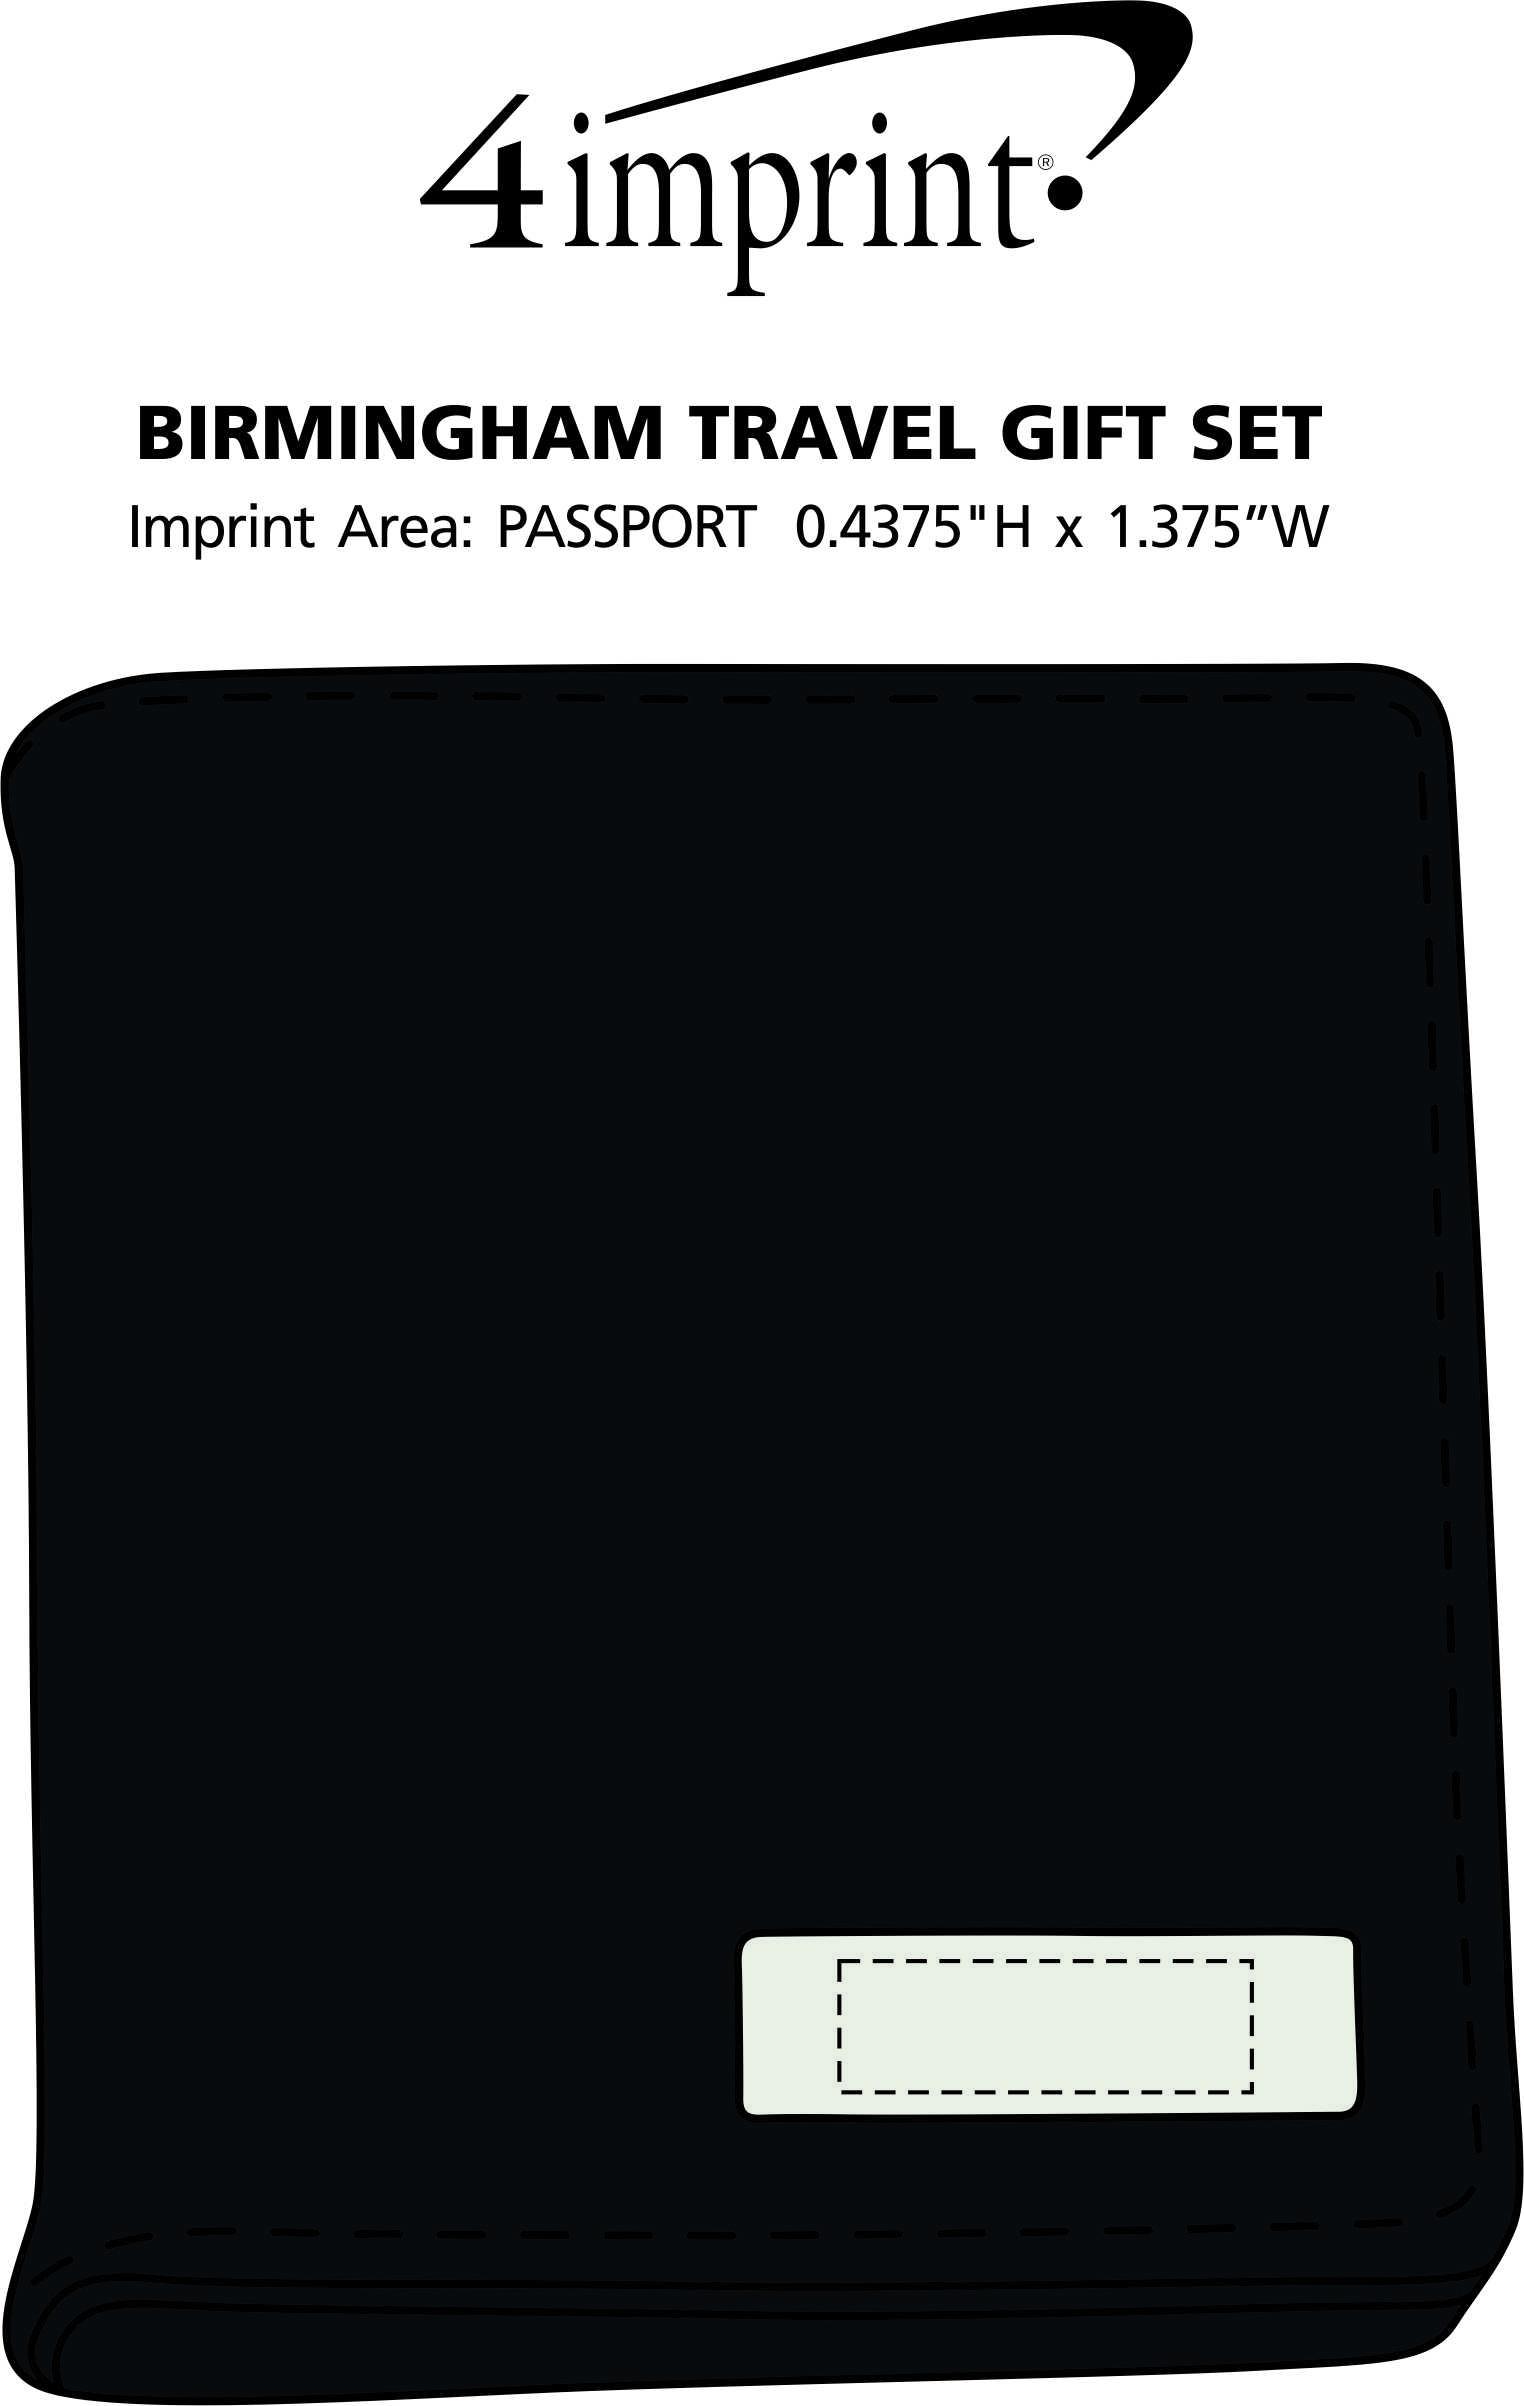 Imprint Area of Birmingham Travel Gift Set